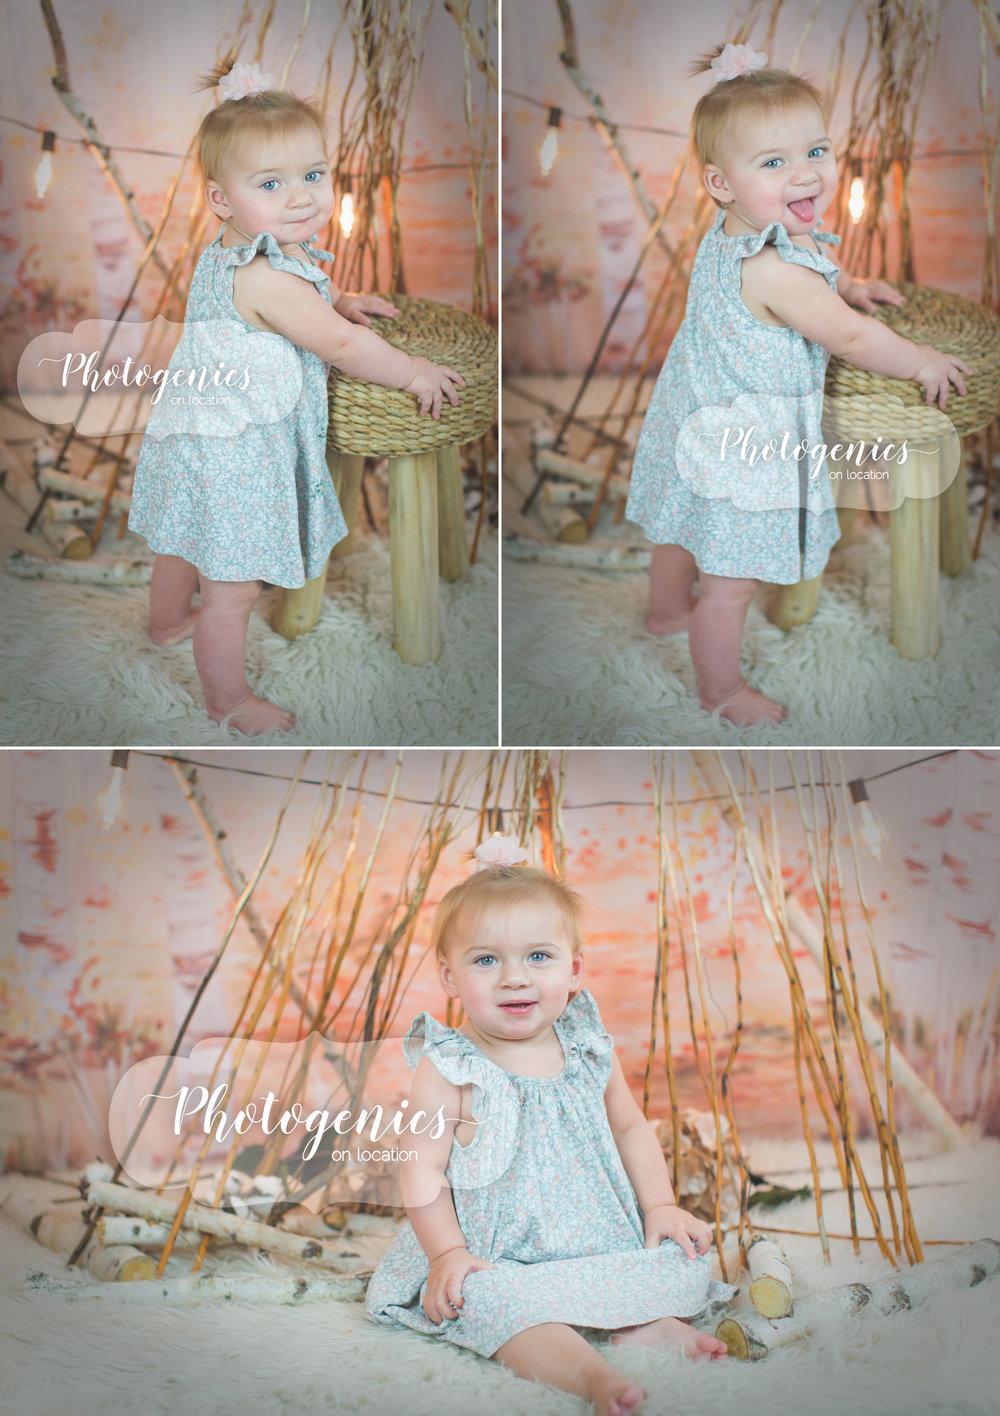 12_months_photography_girly_flowers_pinwheels 2.jpg